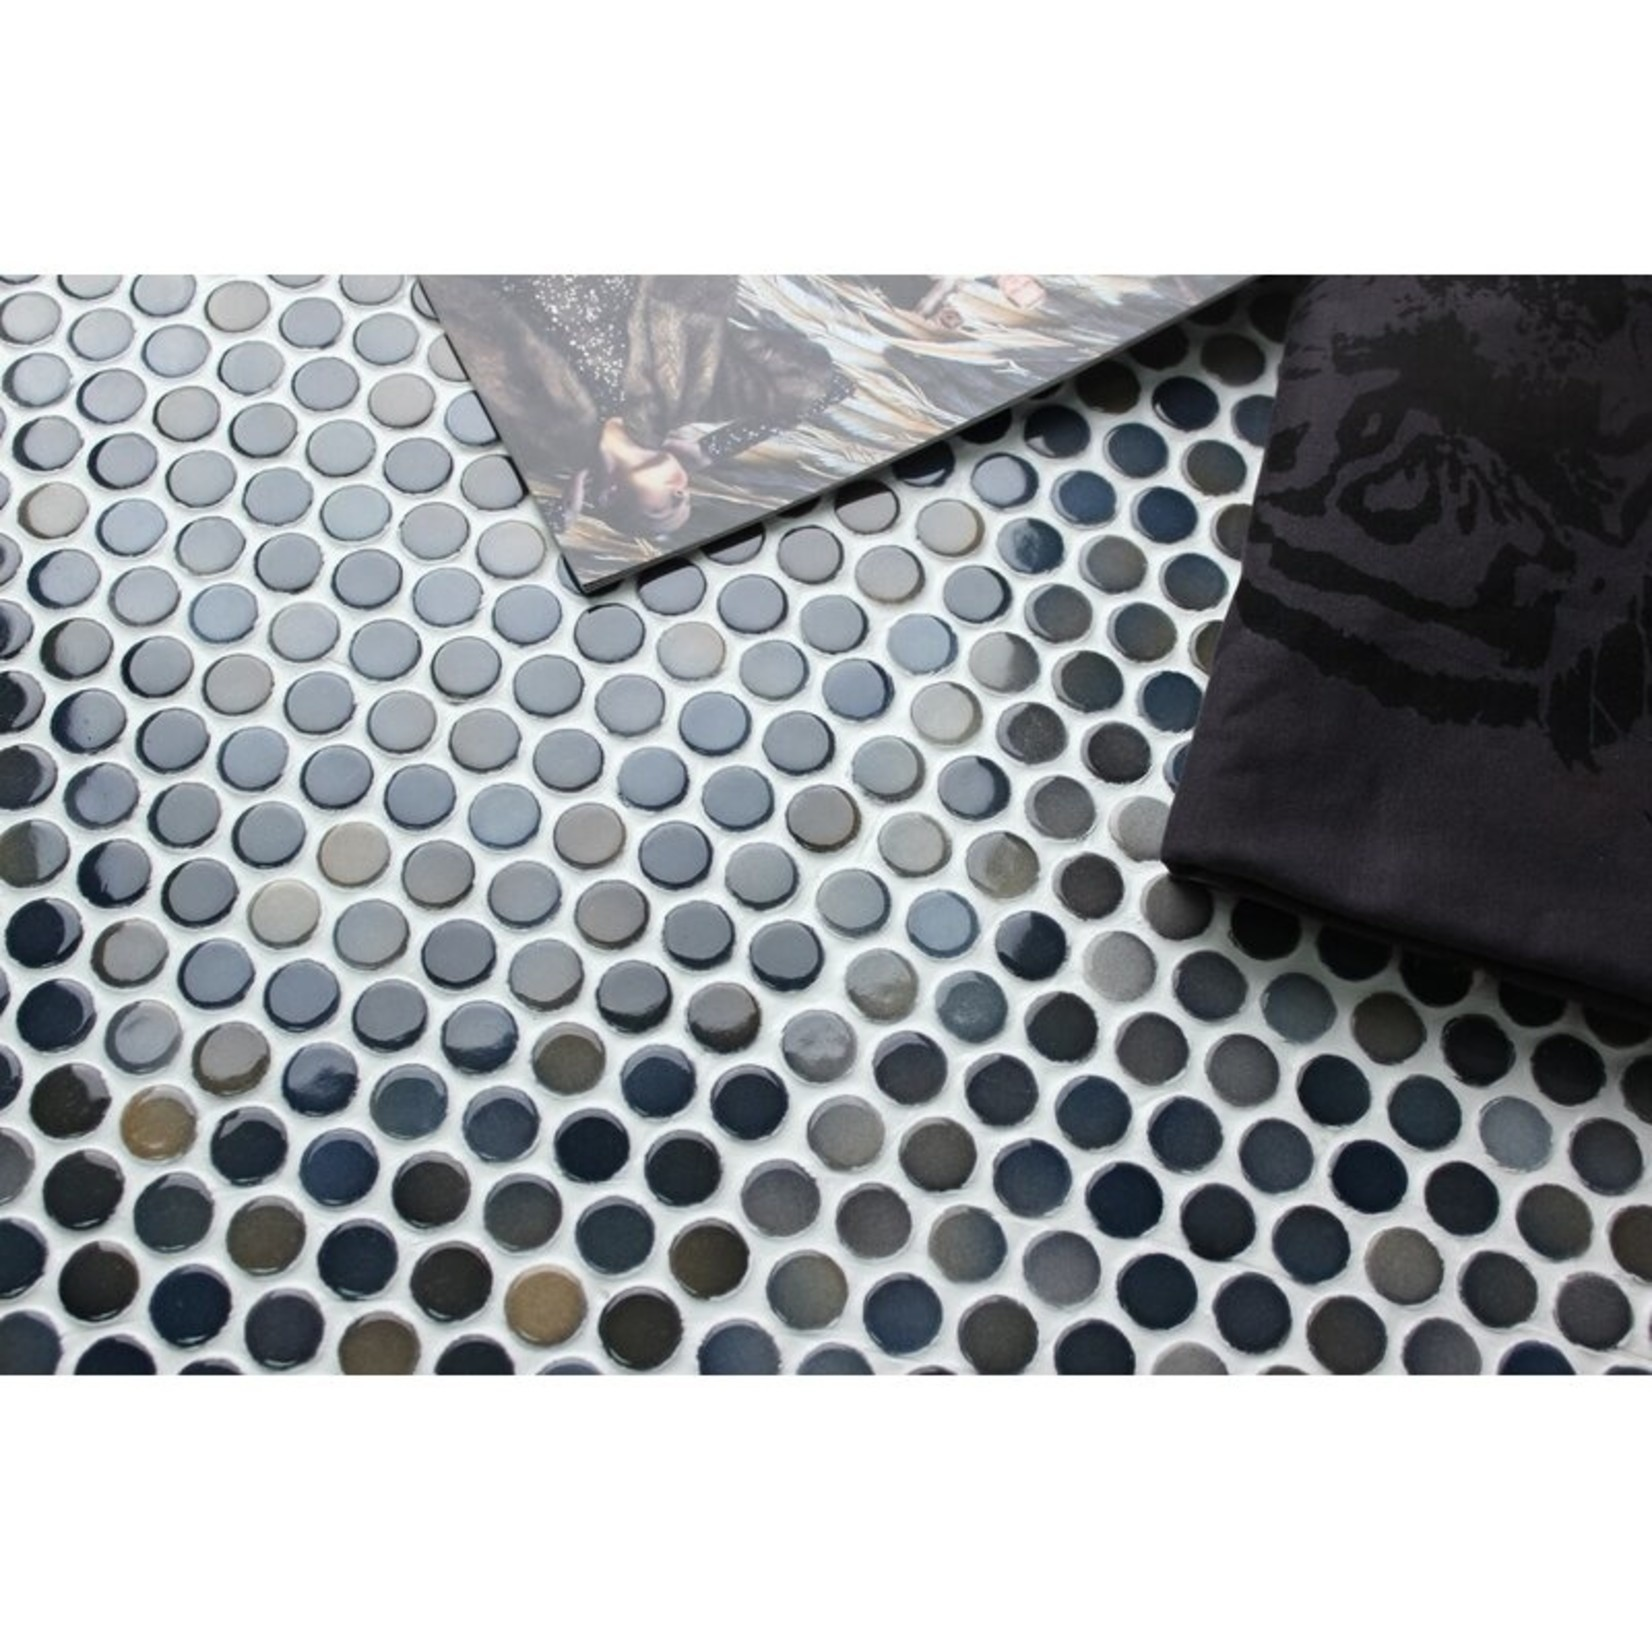 "*Value Series 0.8"" x 0.8"" Porcelain Penny Round Mosaic Wall & Floor Tile - 11 Tile Set (10.1 Sq. Ft.)"